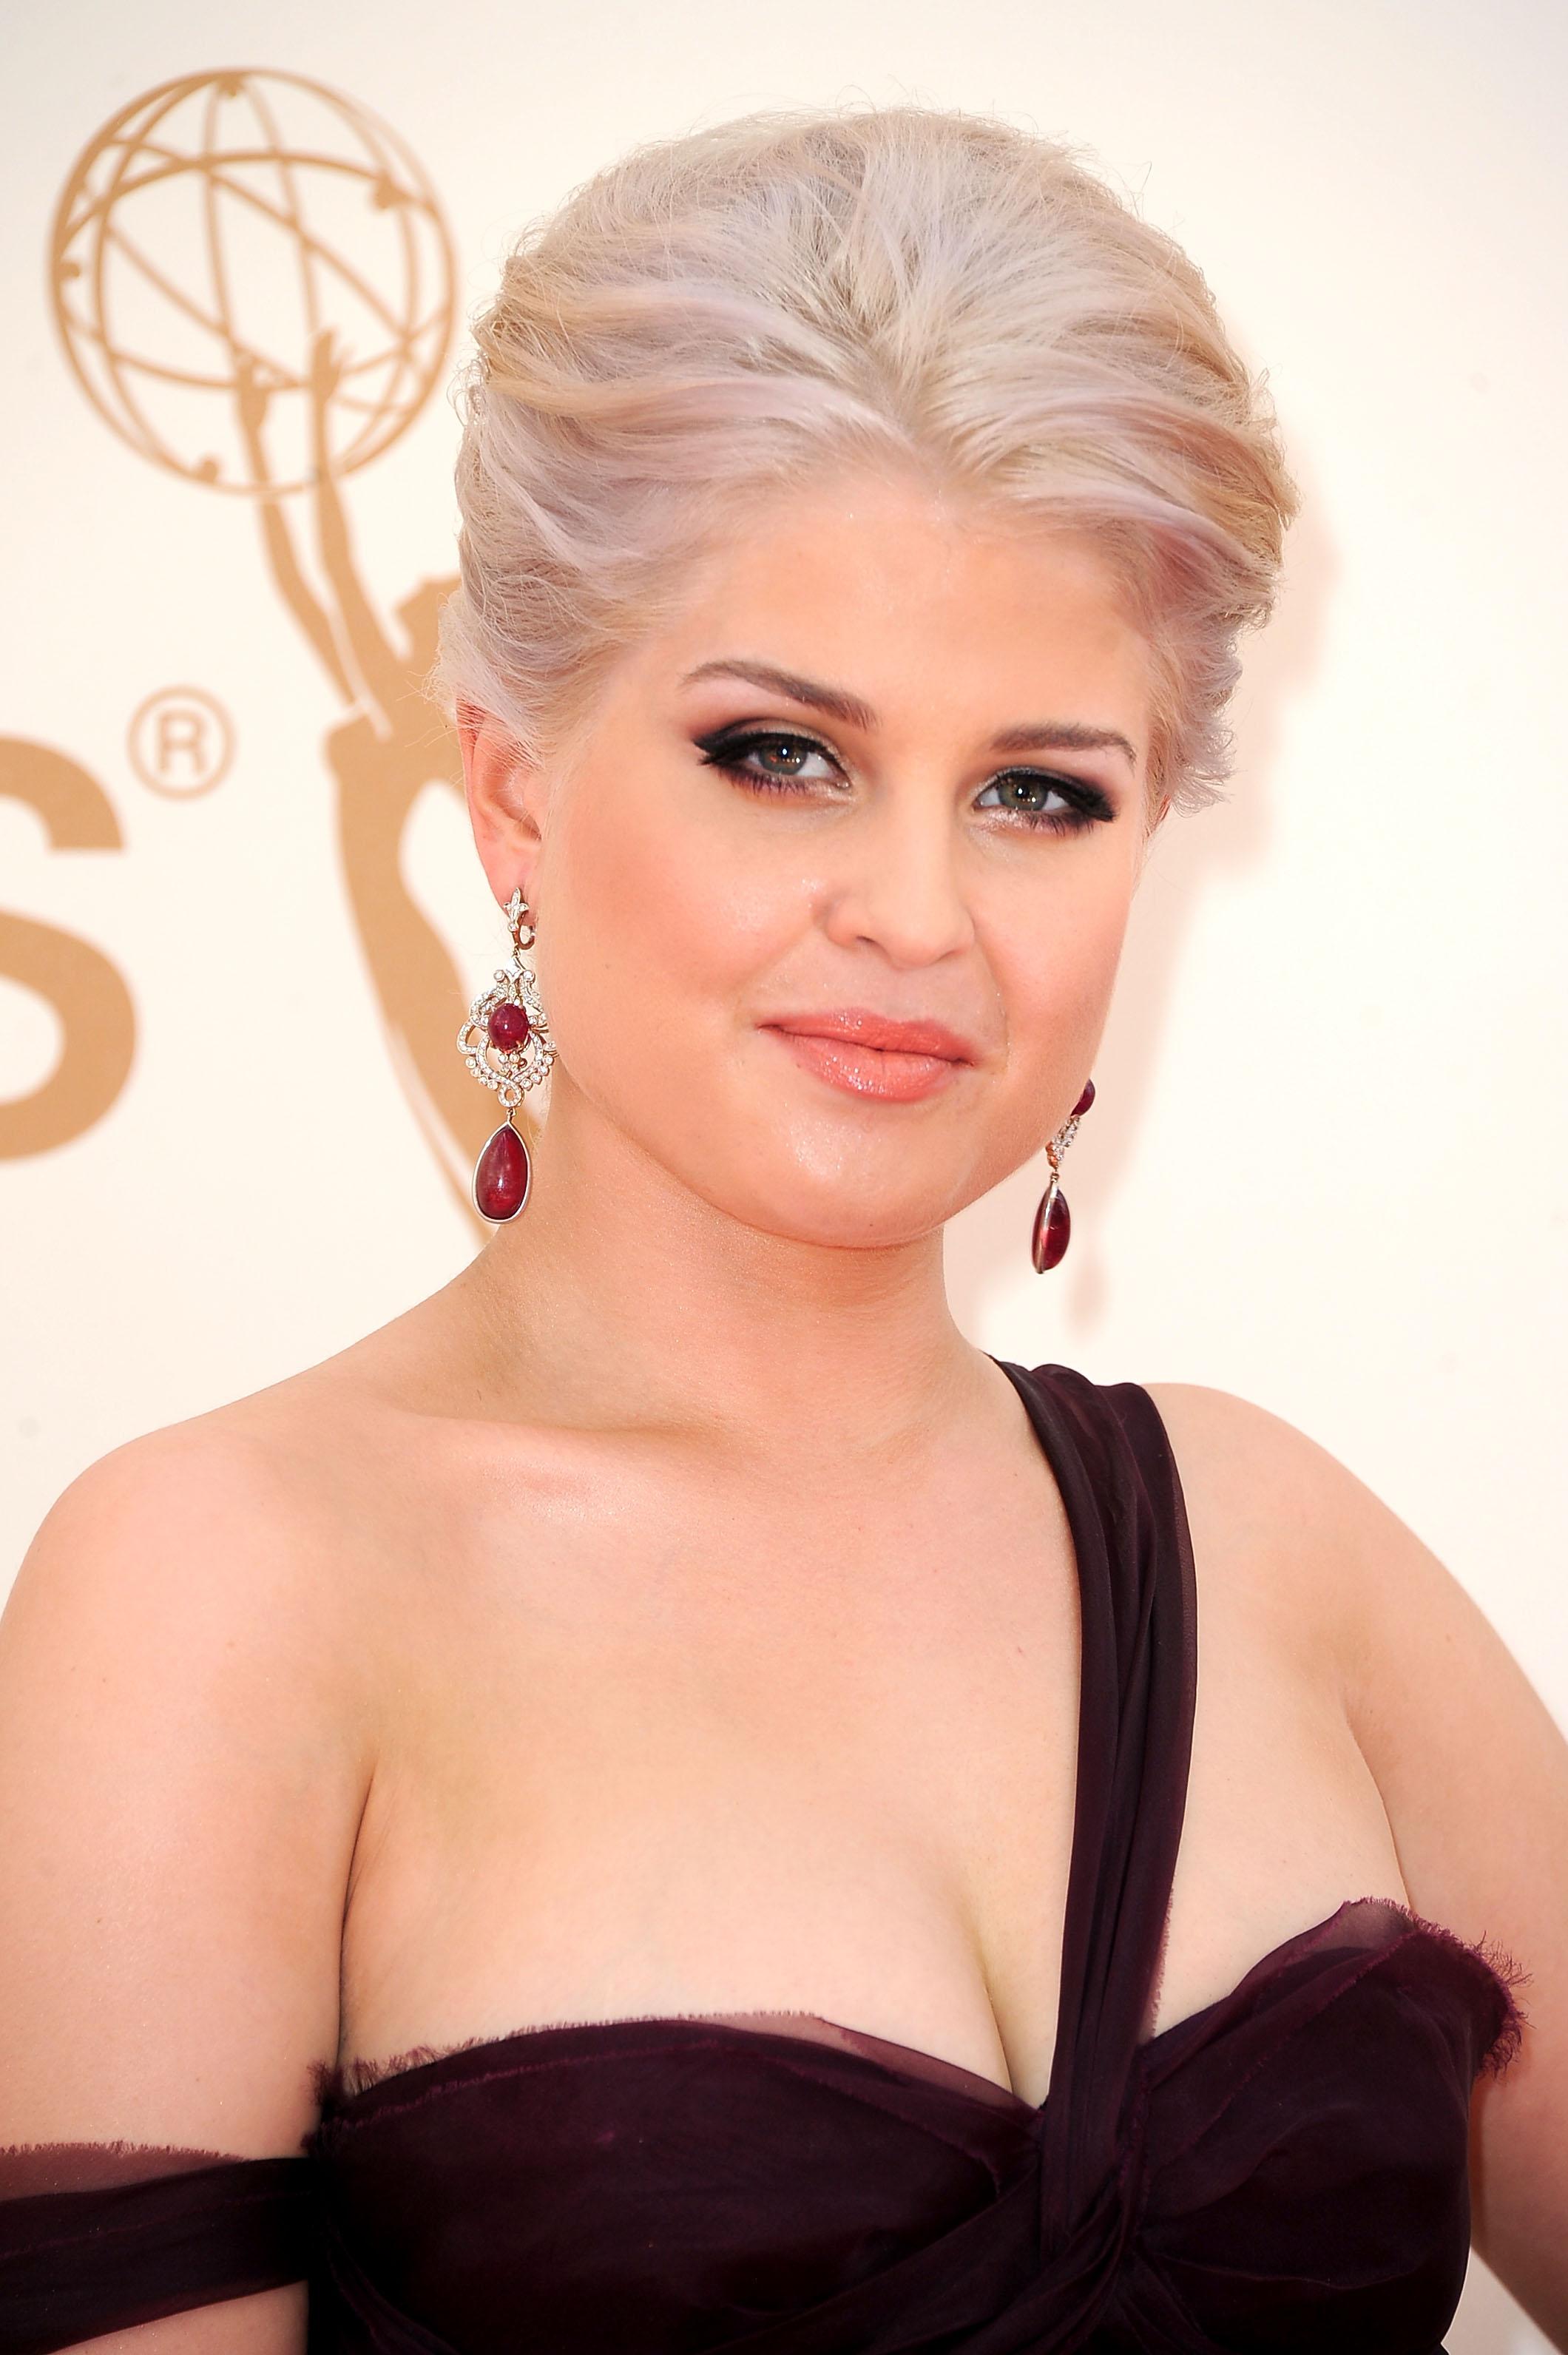 Kelly Osbourne at the Emmys.